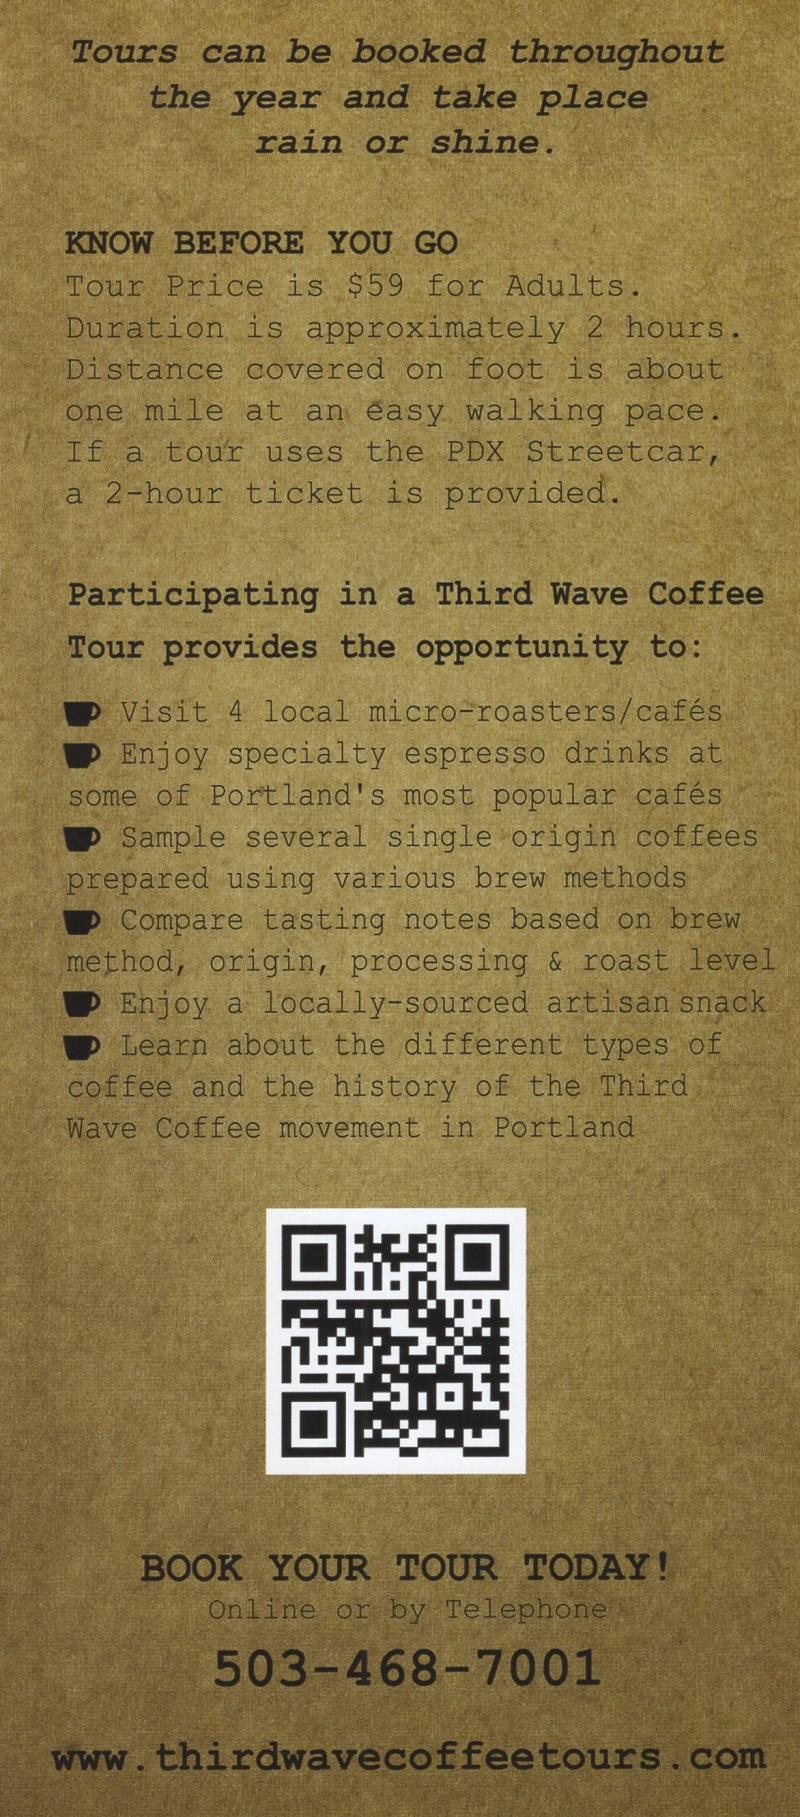 Third Wave Coffee Tours brochure thumbnail